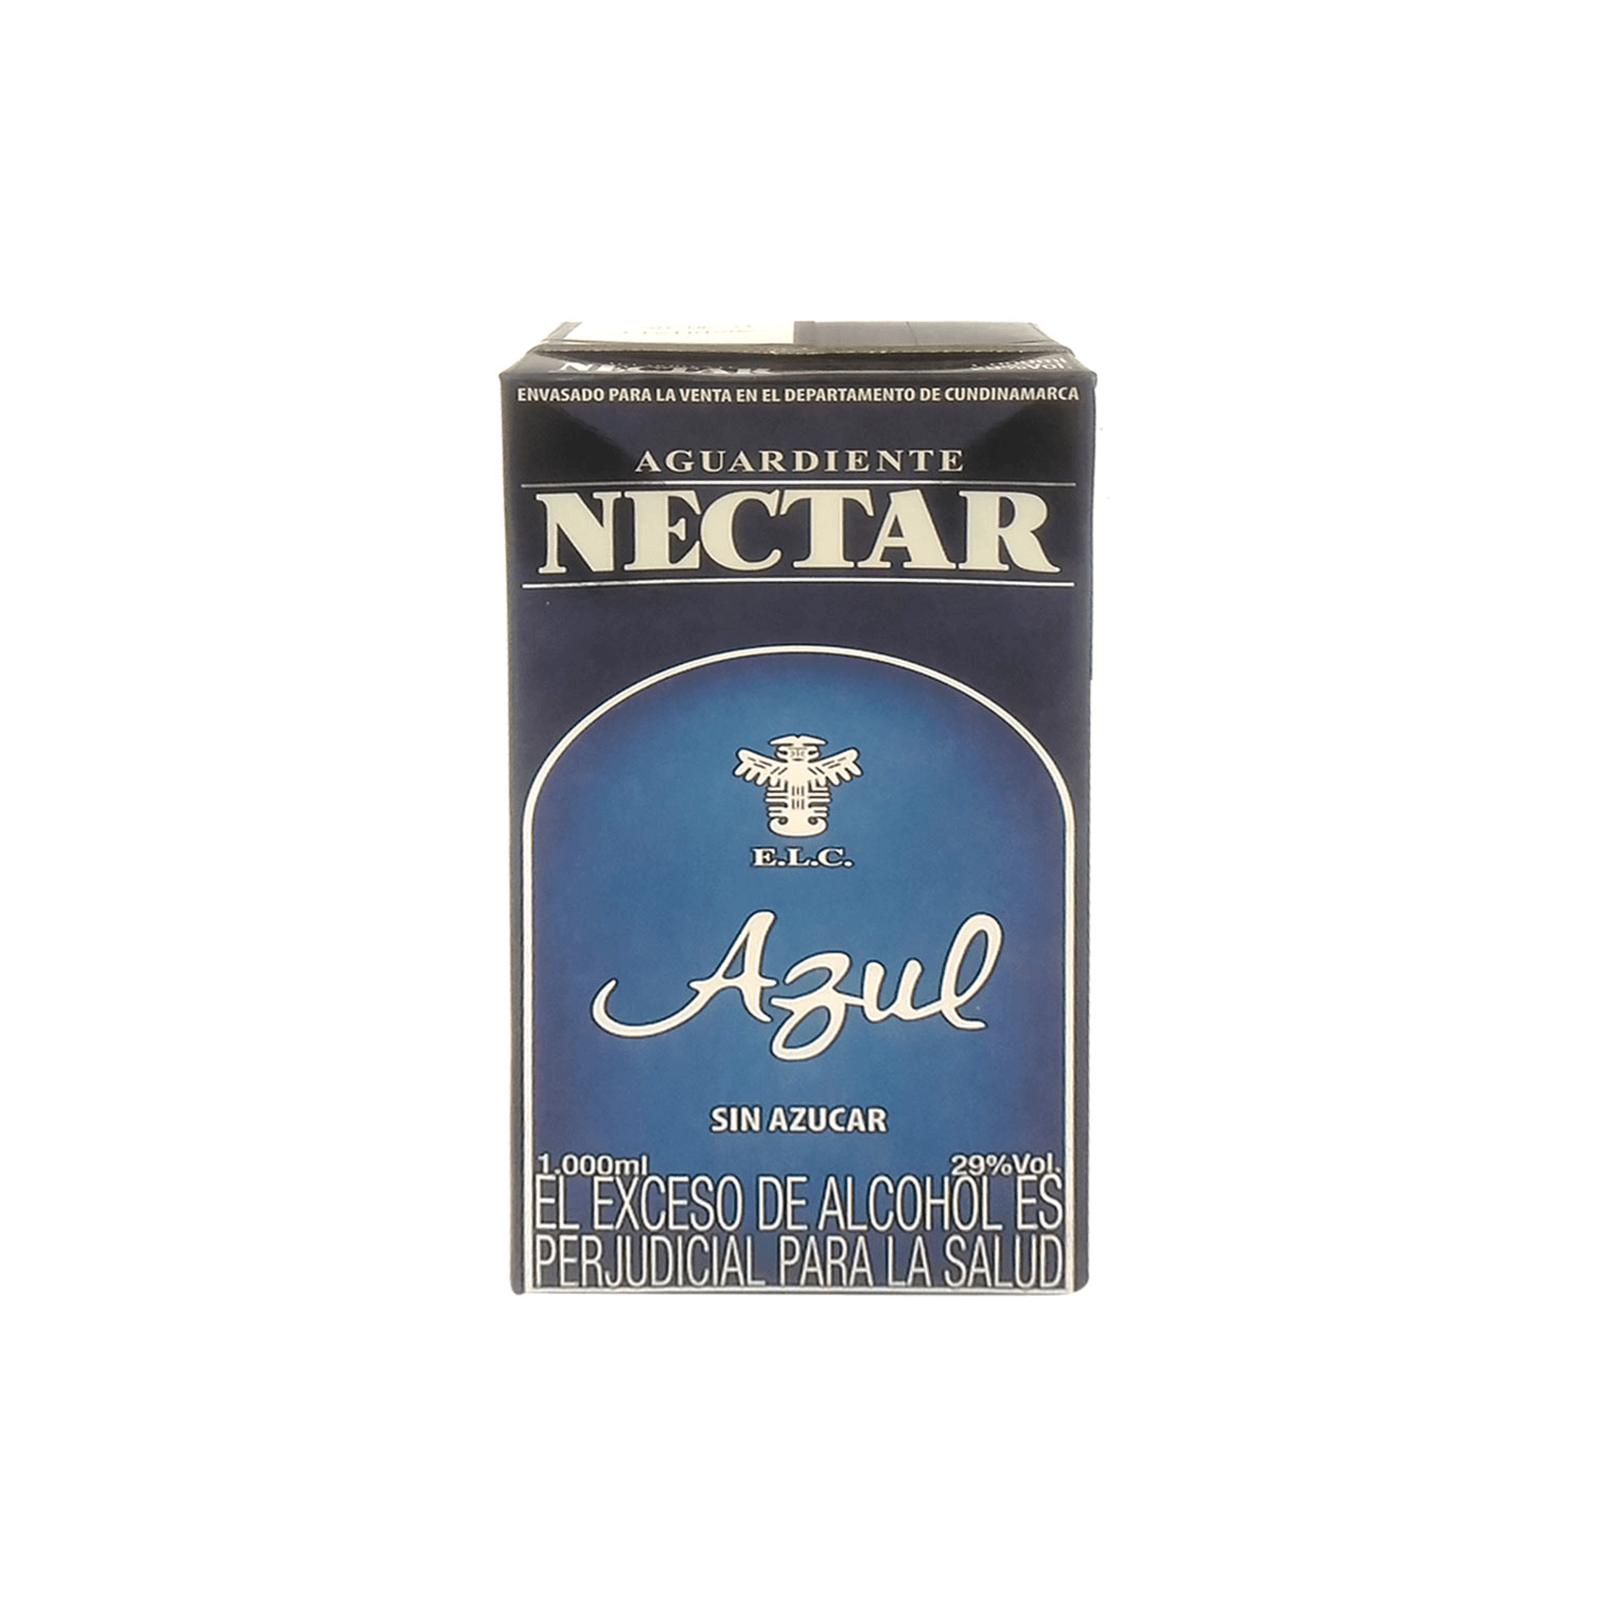 Aguardiente Tetra Sin Azucar Nectar Azul